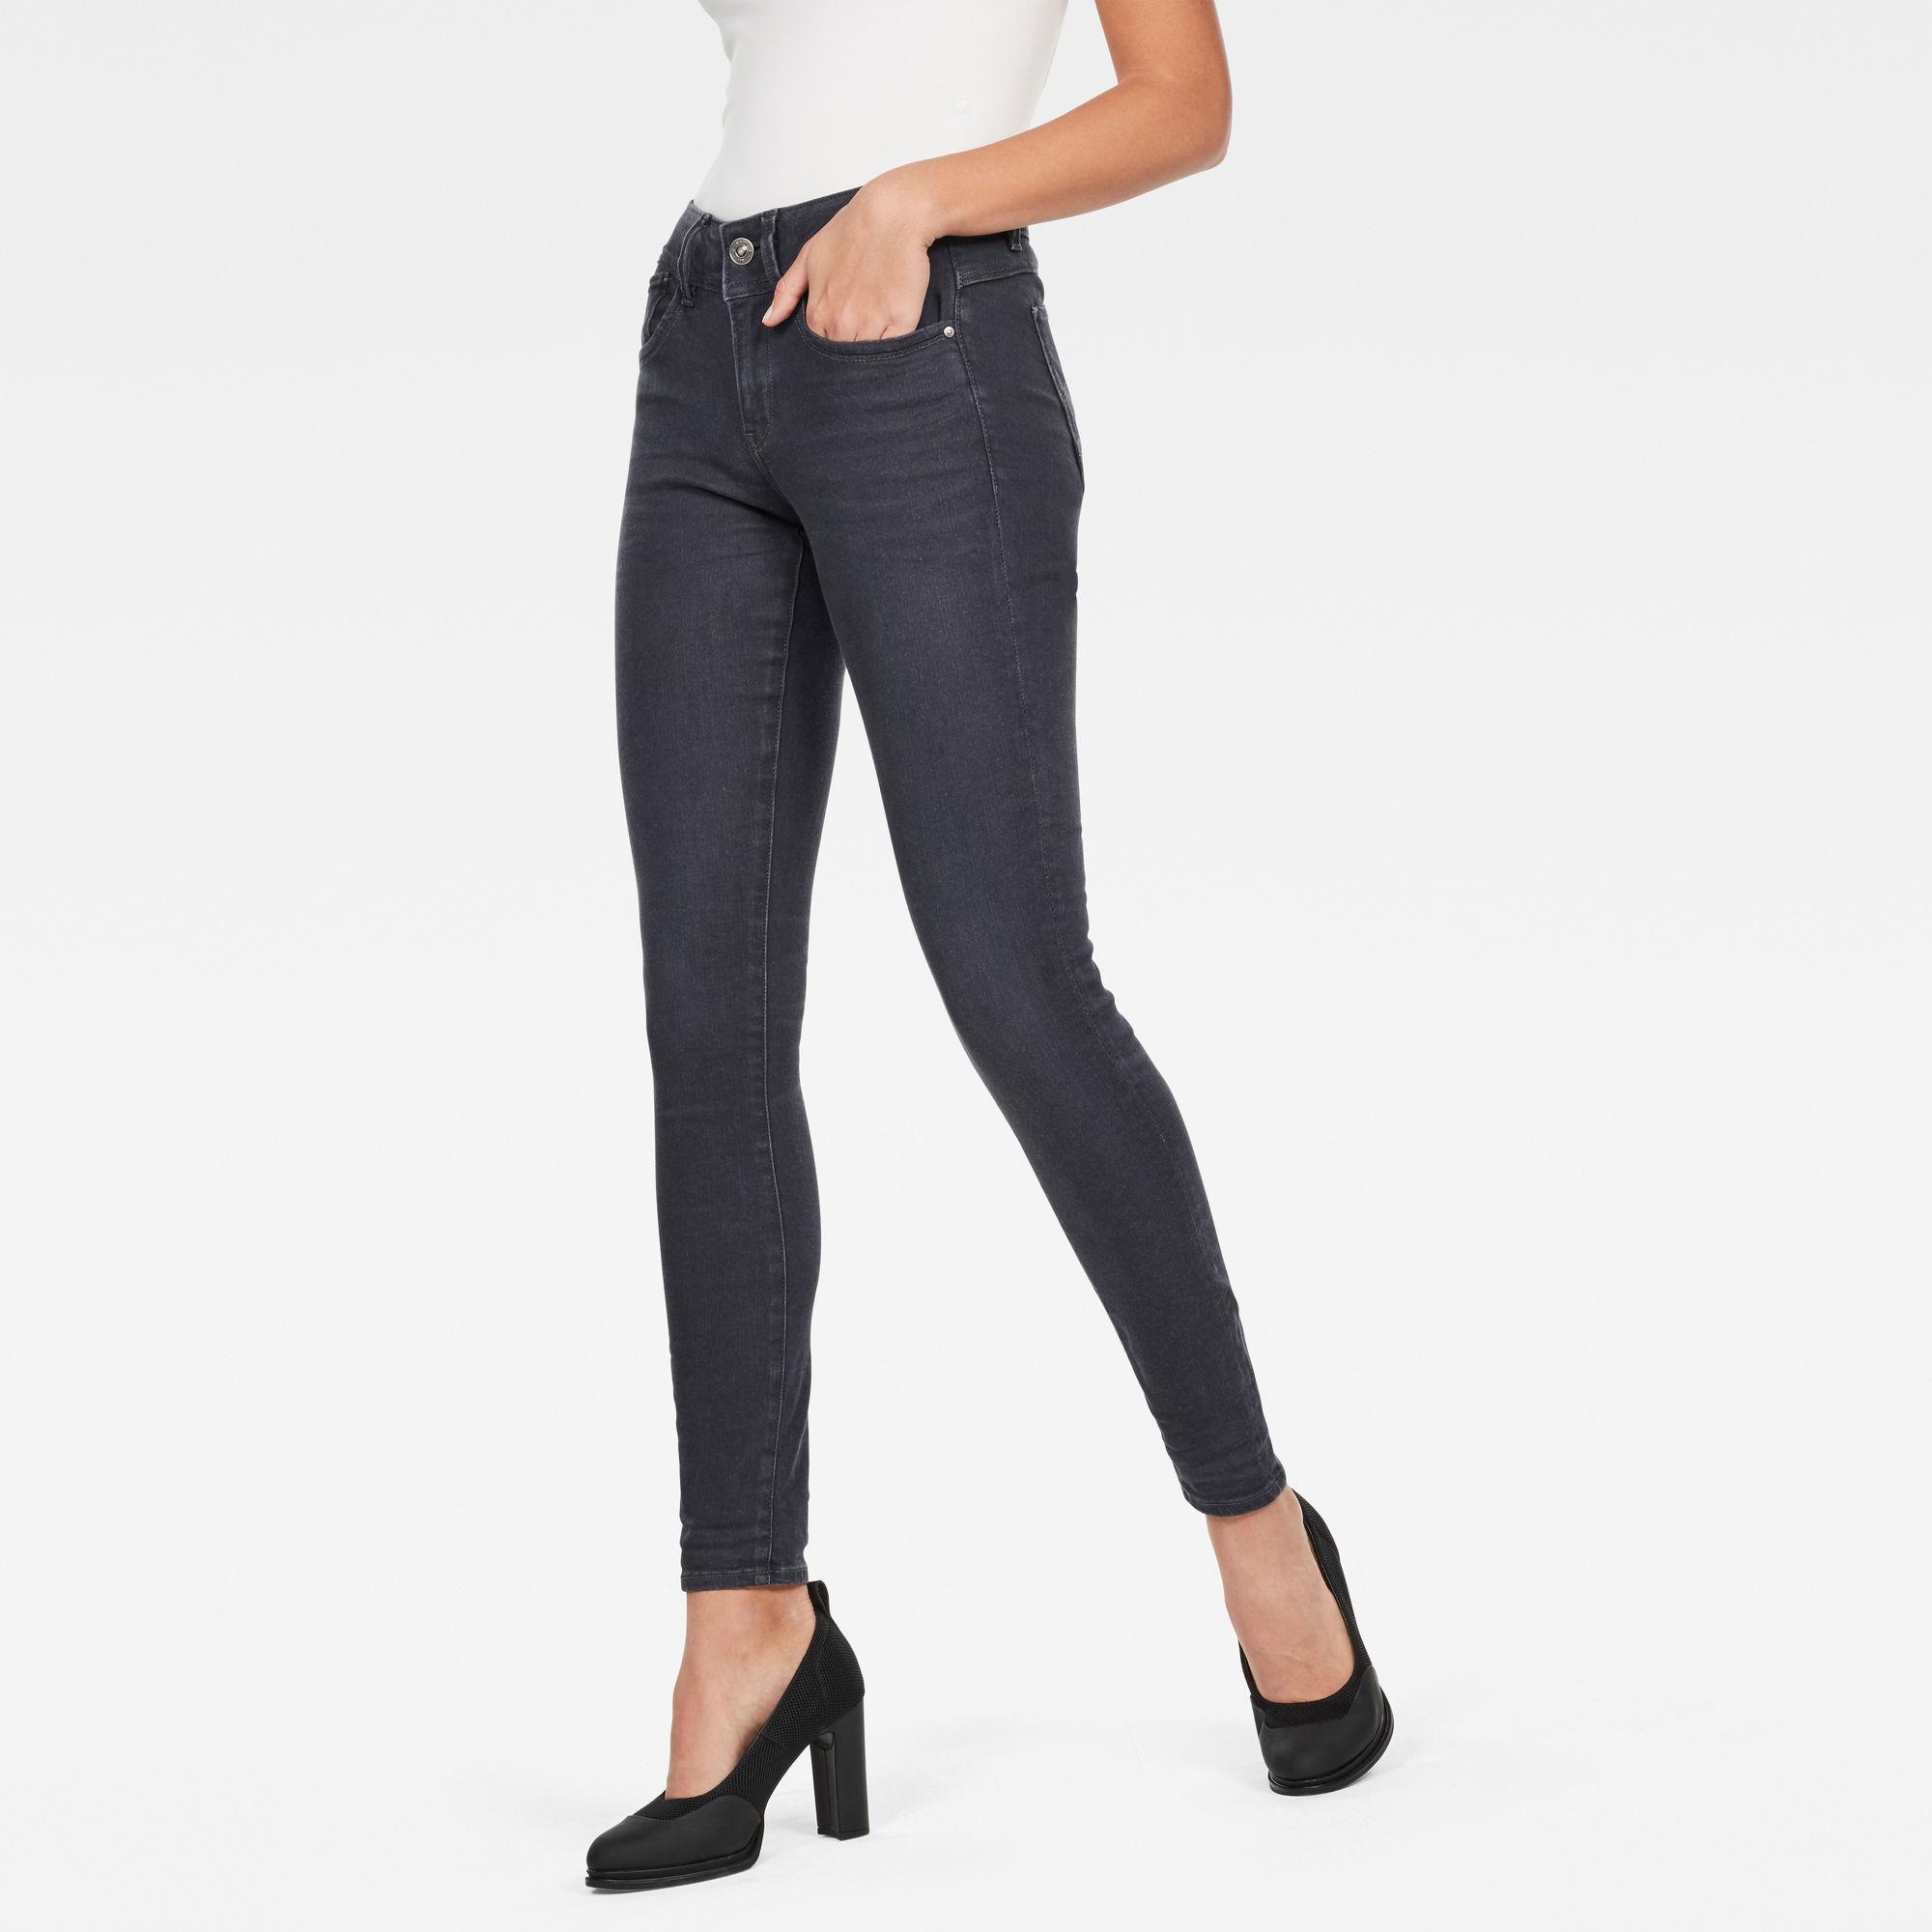 Image of G Star Raw Lynn Mid Waist Skinny Jeans